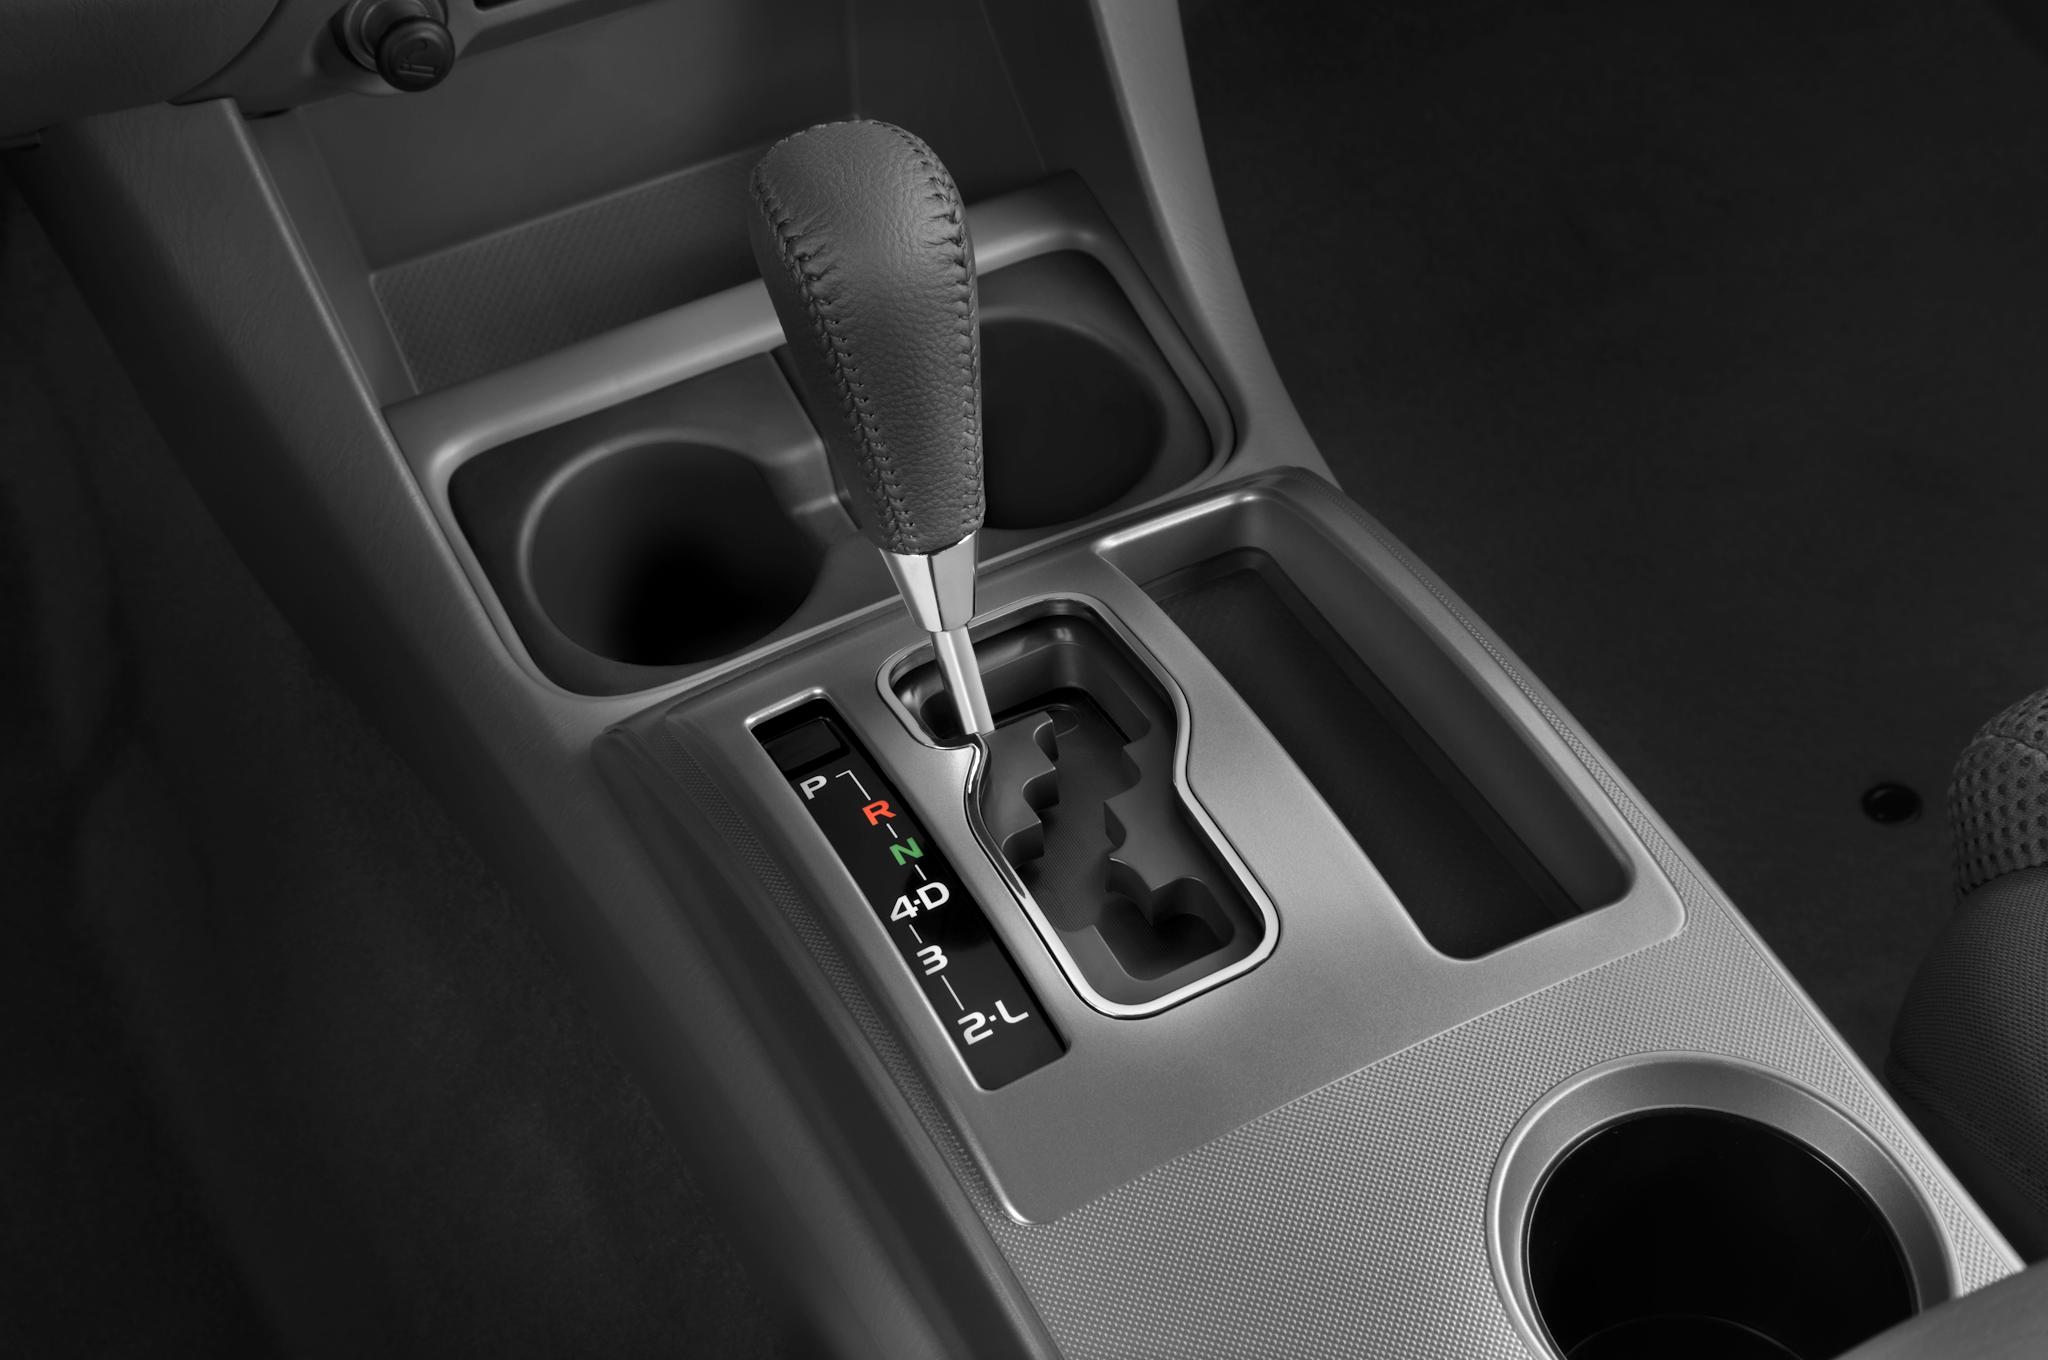 2012 toyota tacoma pricing begins at 17 685 rh automobilemag com 2011 toyota tacoma manual transmission fluid change 2006 Toyota Tacoma Manual Transmission